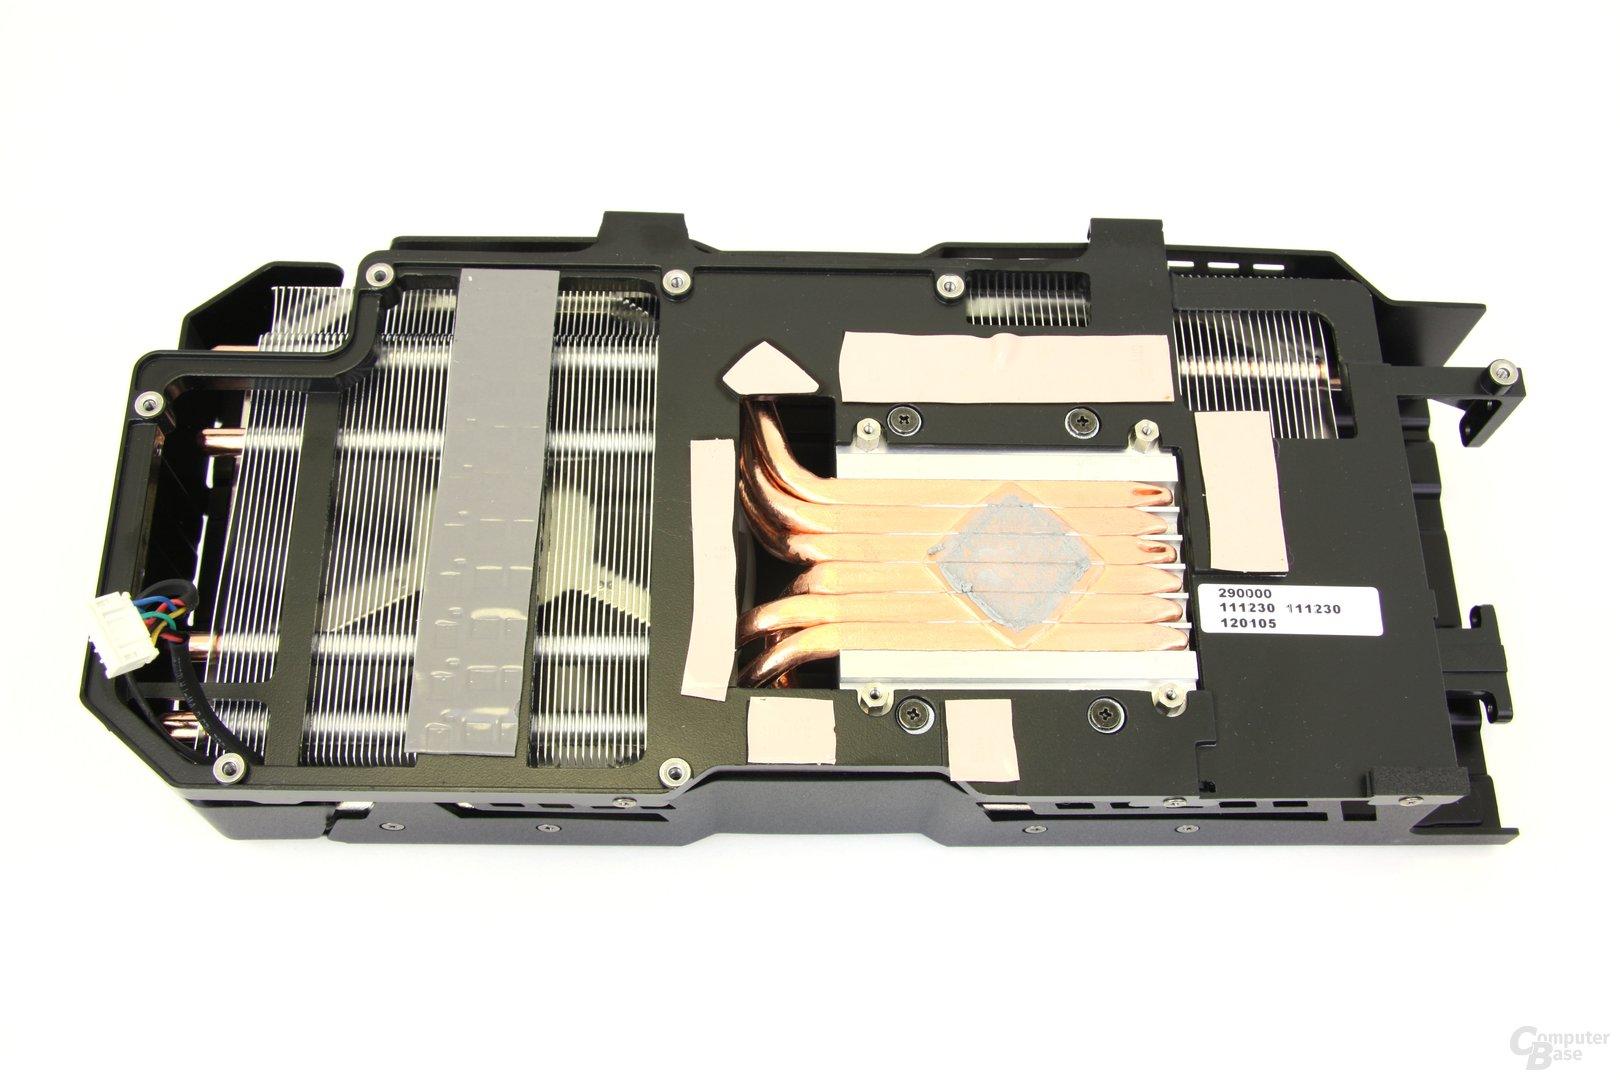 Radeon HD 7970 DCII Kühlerrückseite